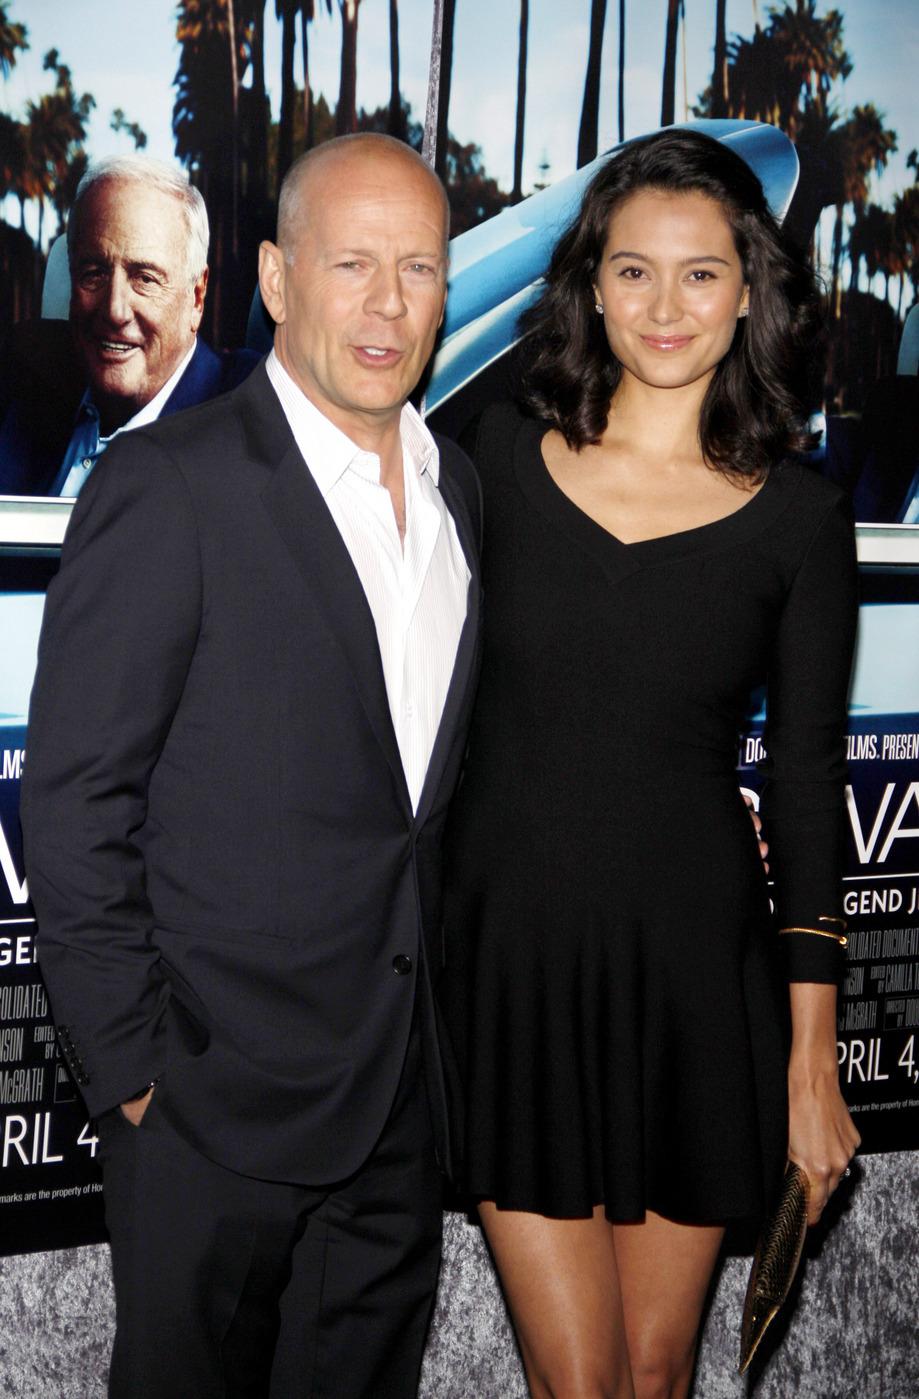 Bruce Willis With Wife Emma Hemming Latest Photographs ...